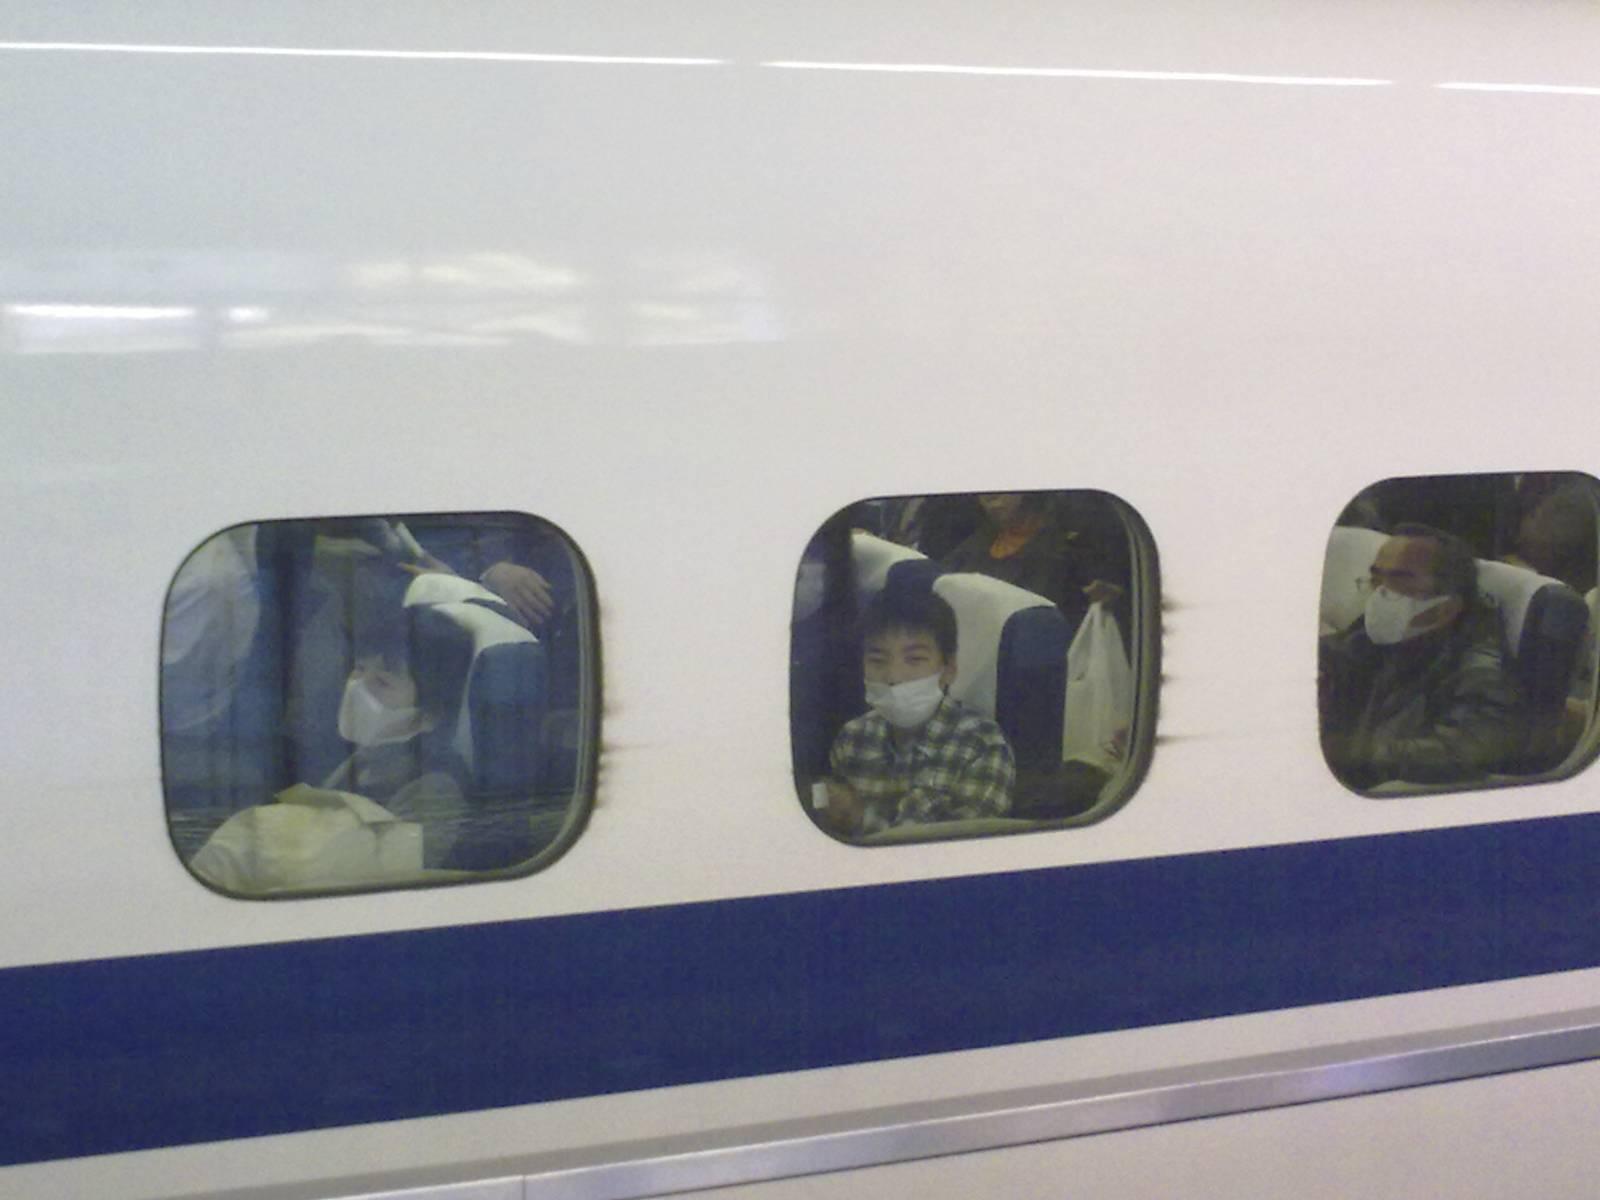 Giappone-train-shinkansen-japan-trip